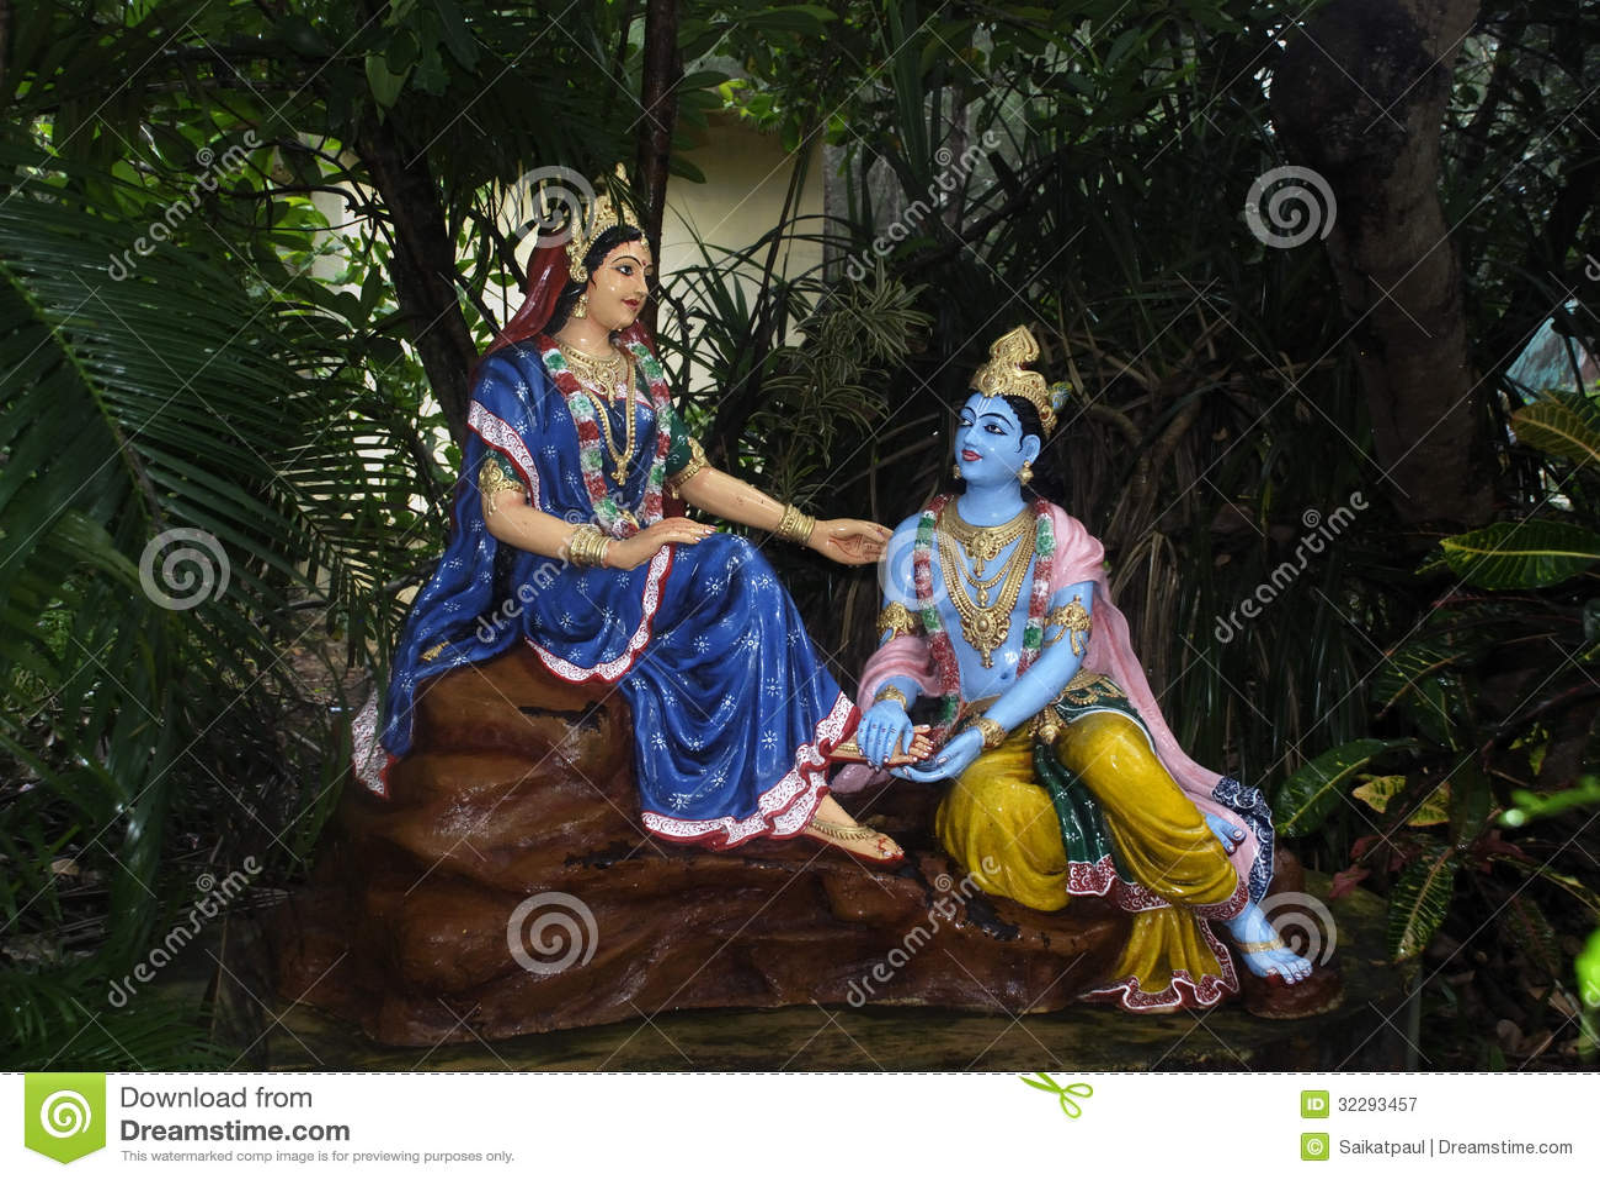 Romantic Radha Krishna Wallpaper Hd Radha Krishna Royalty Free Stock Photography Image 32293457